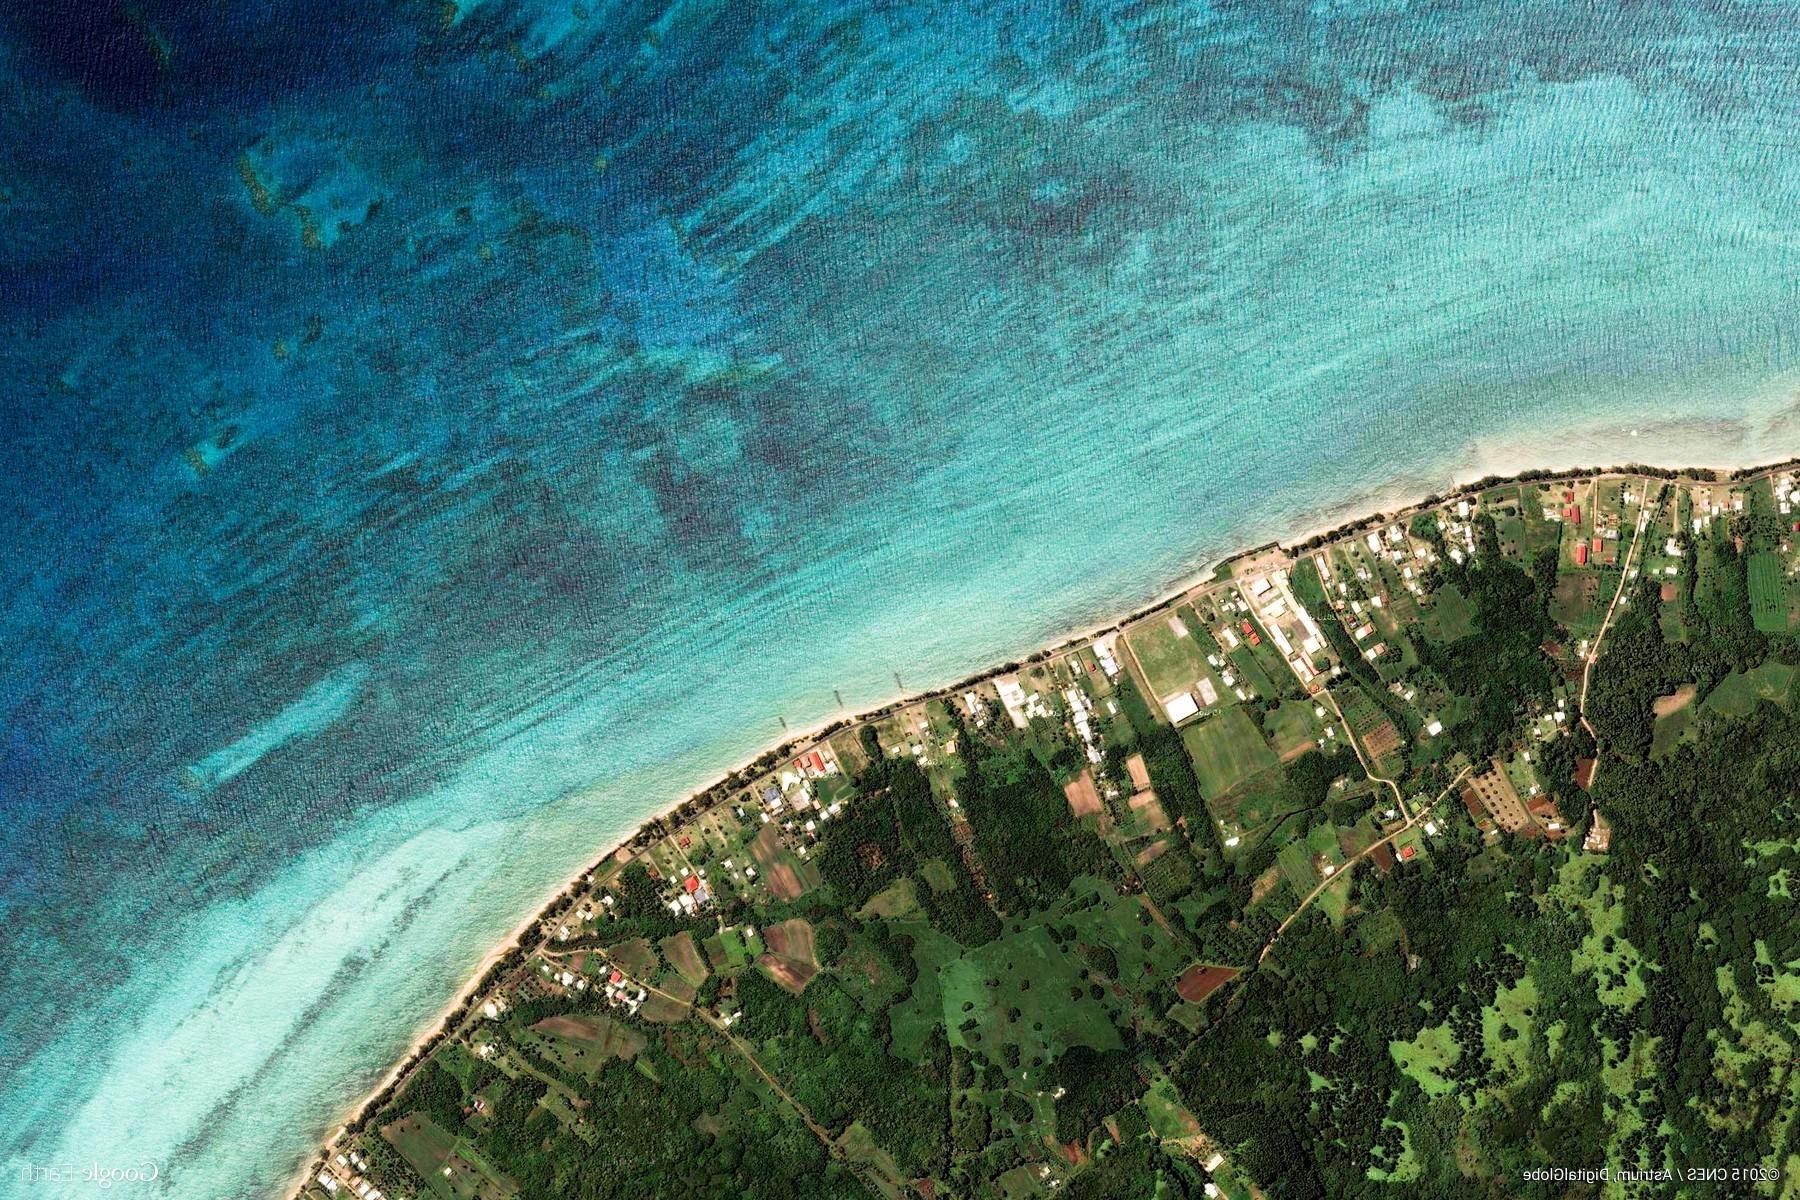 Wallpaper : landscape, sea, nature, Earth, coast, aerial